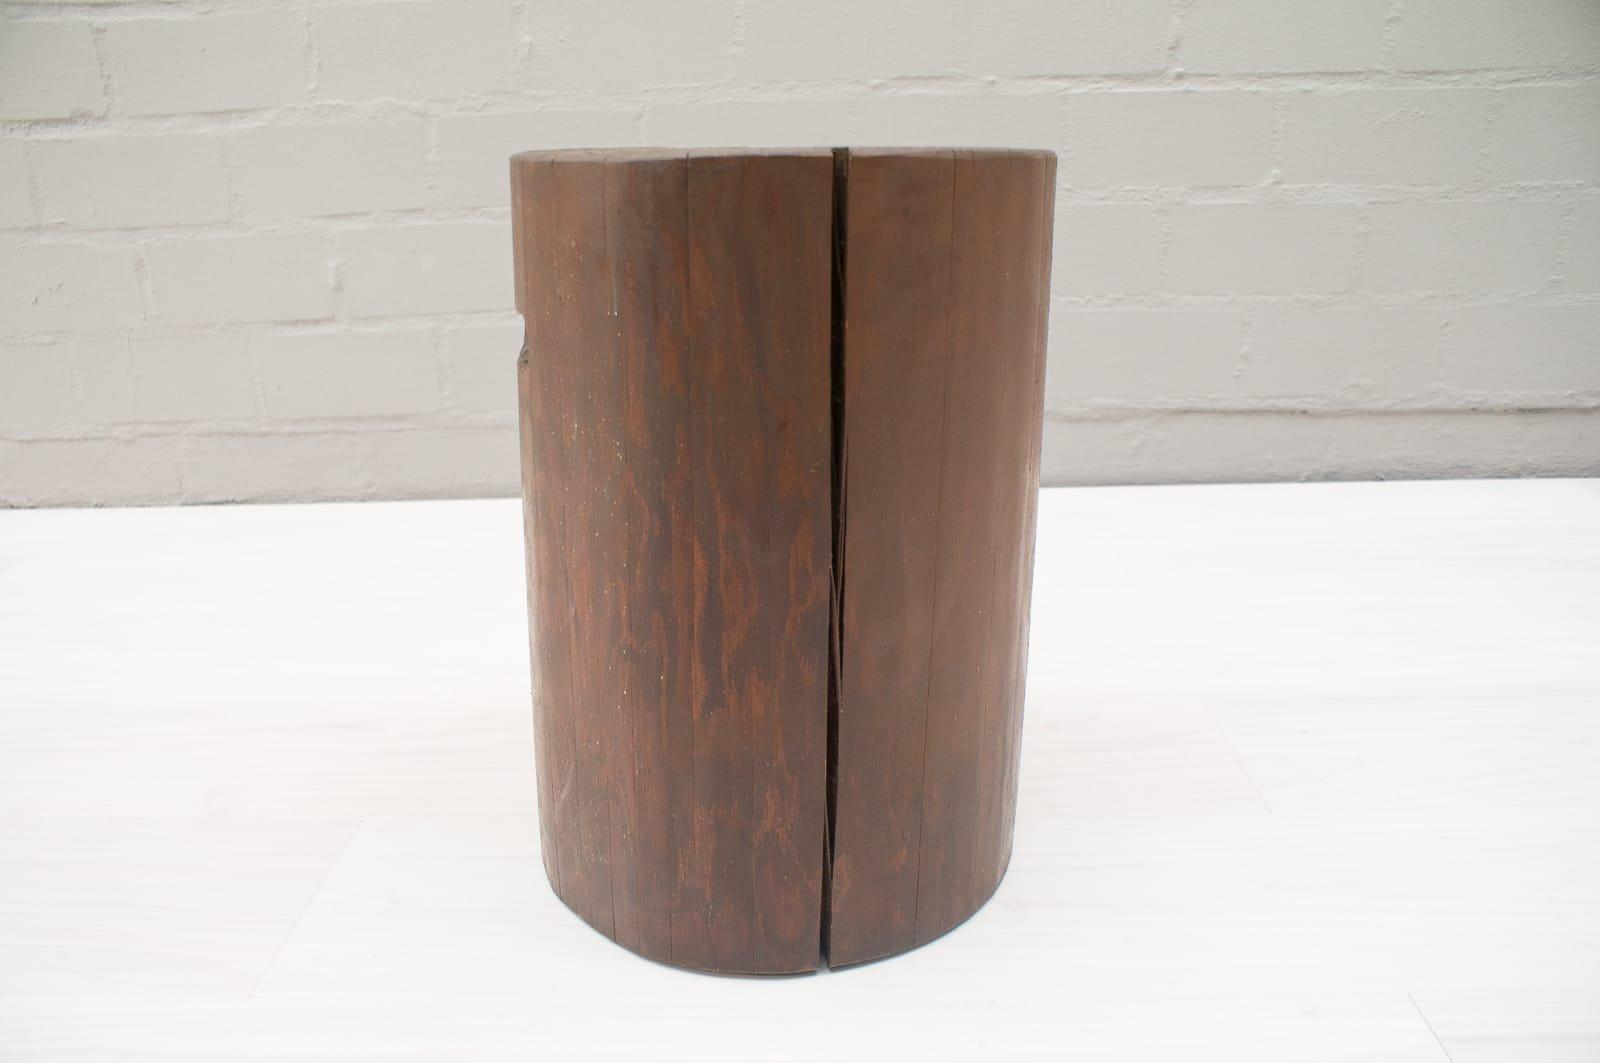 vintage baumstamm hocker 1940er bei pamono kaufen. Black Bedroom Furniture Sets. Home Design Ideas